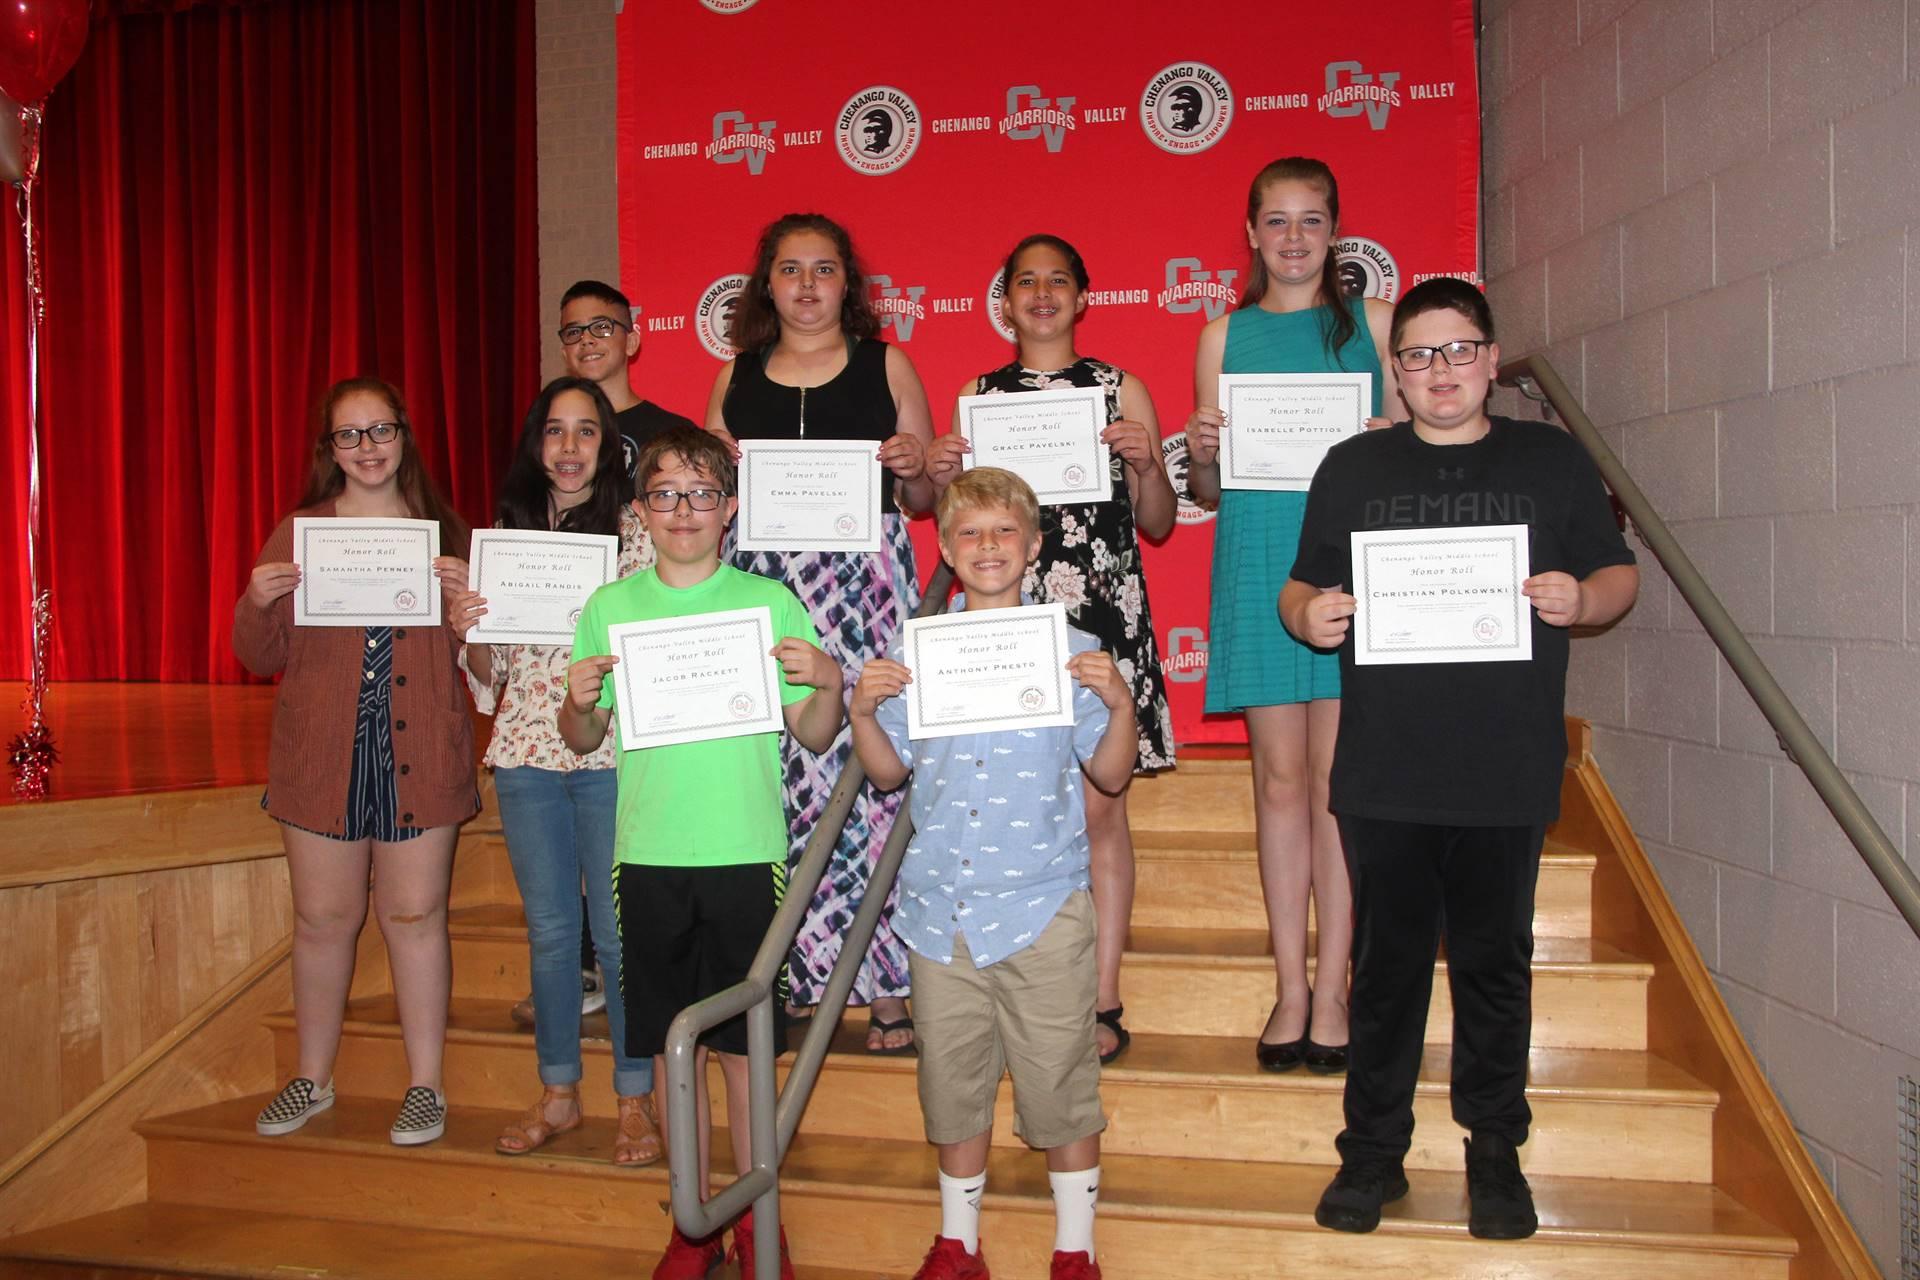 Sixth and seventh grade awards 45